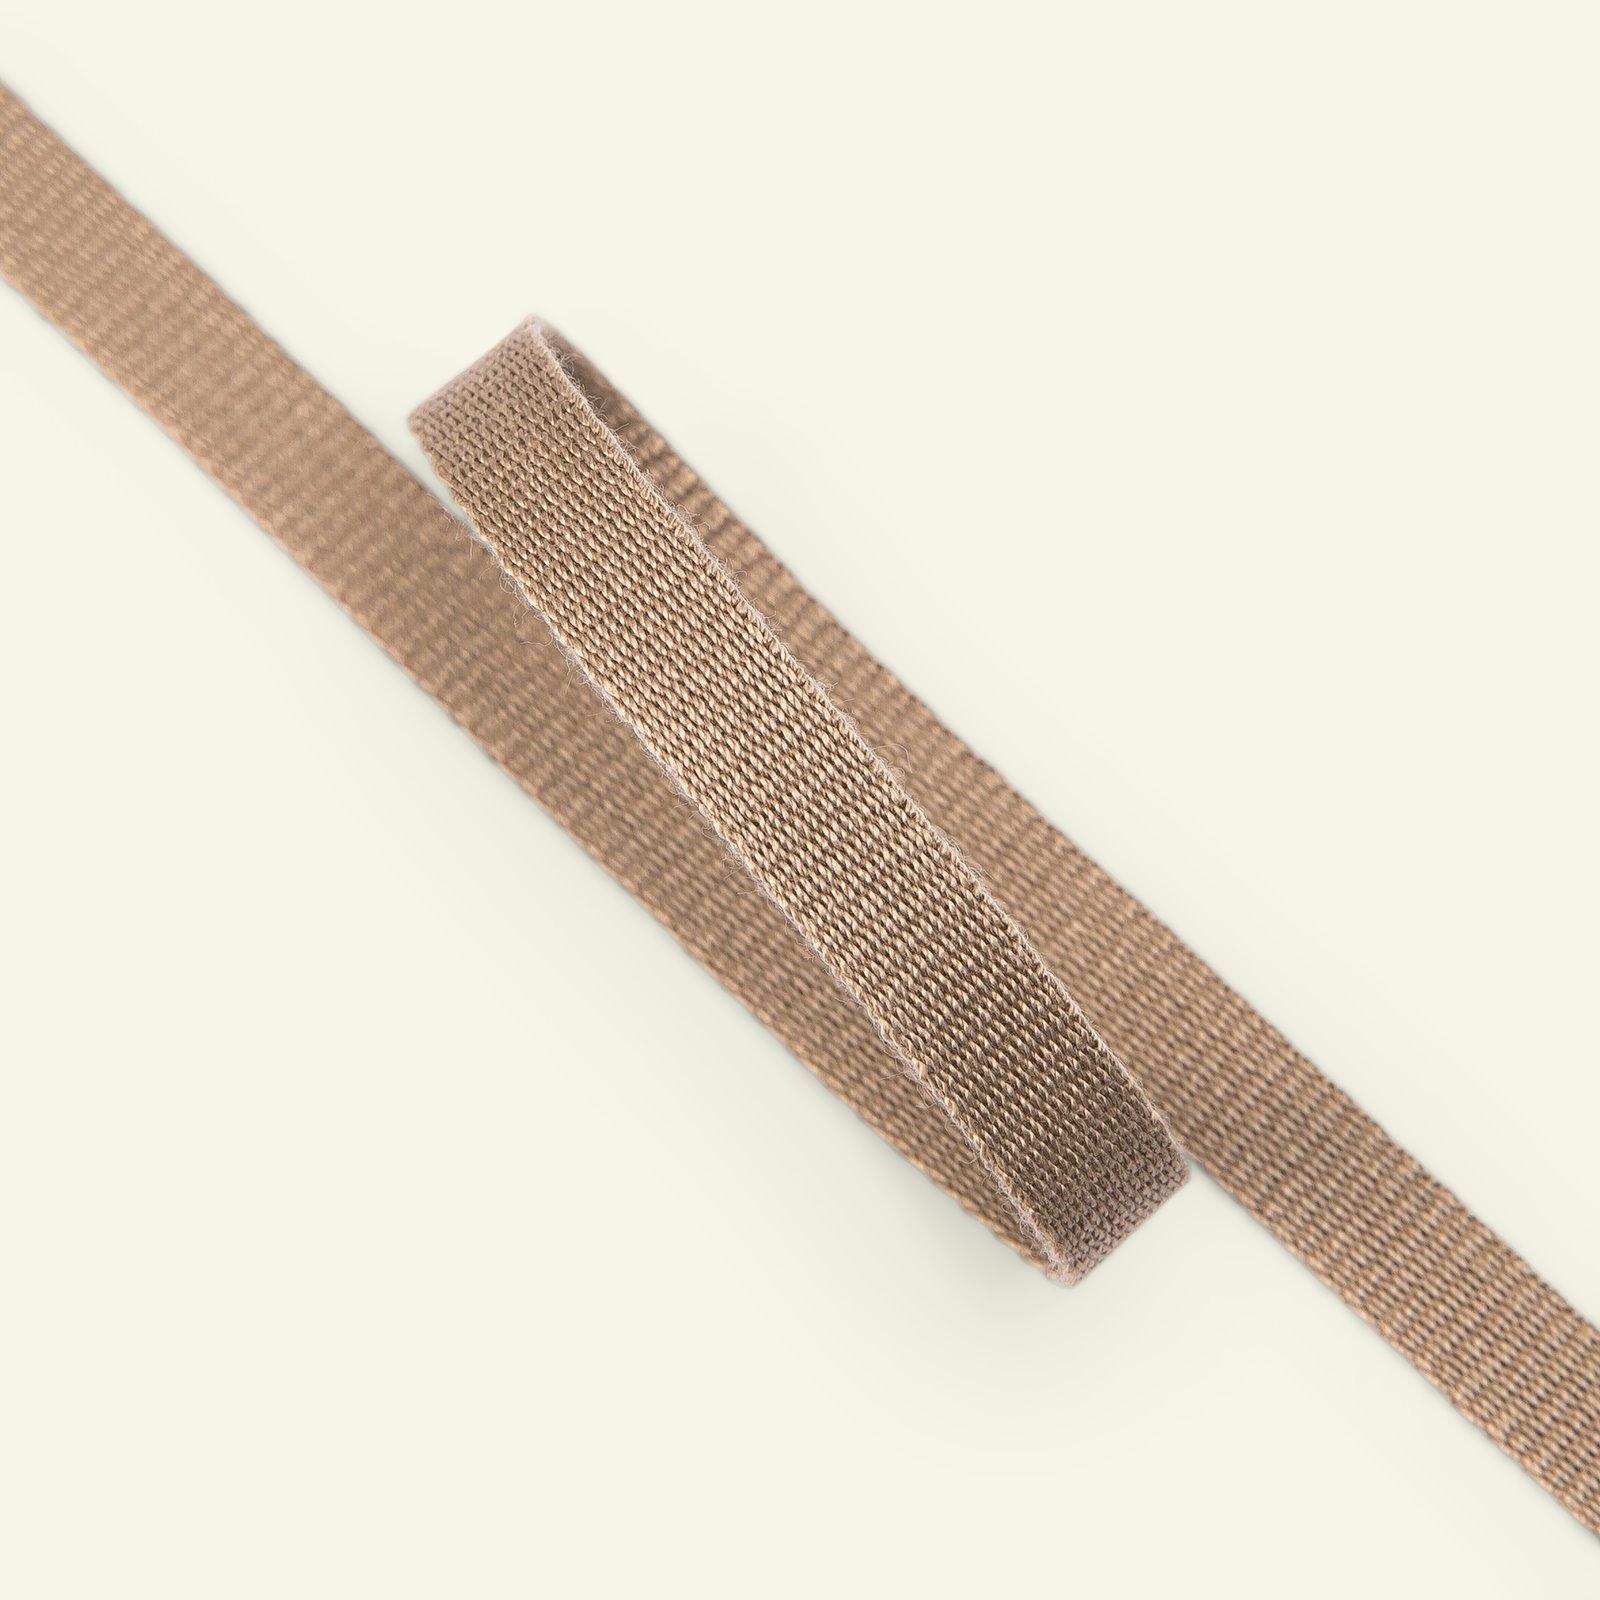 Ribbon woven 10mm dark beige 3m 22319_pack